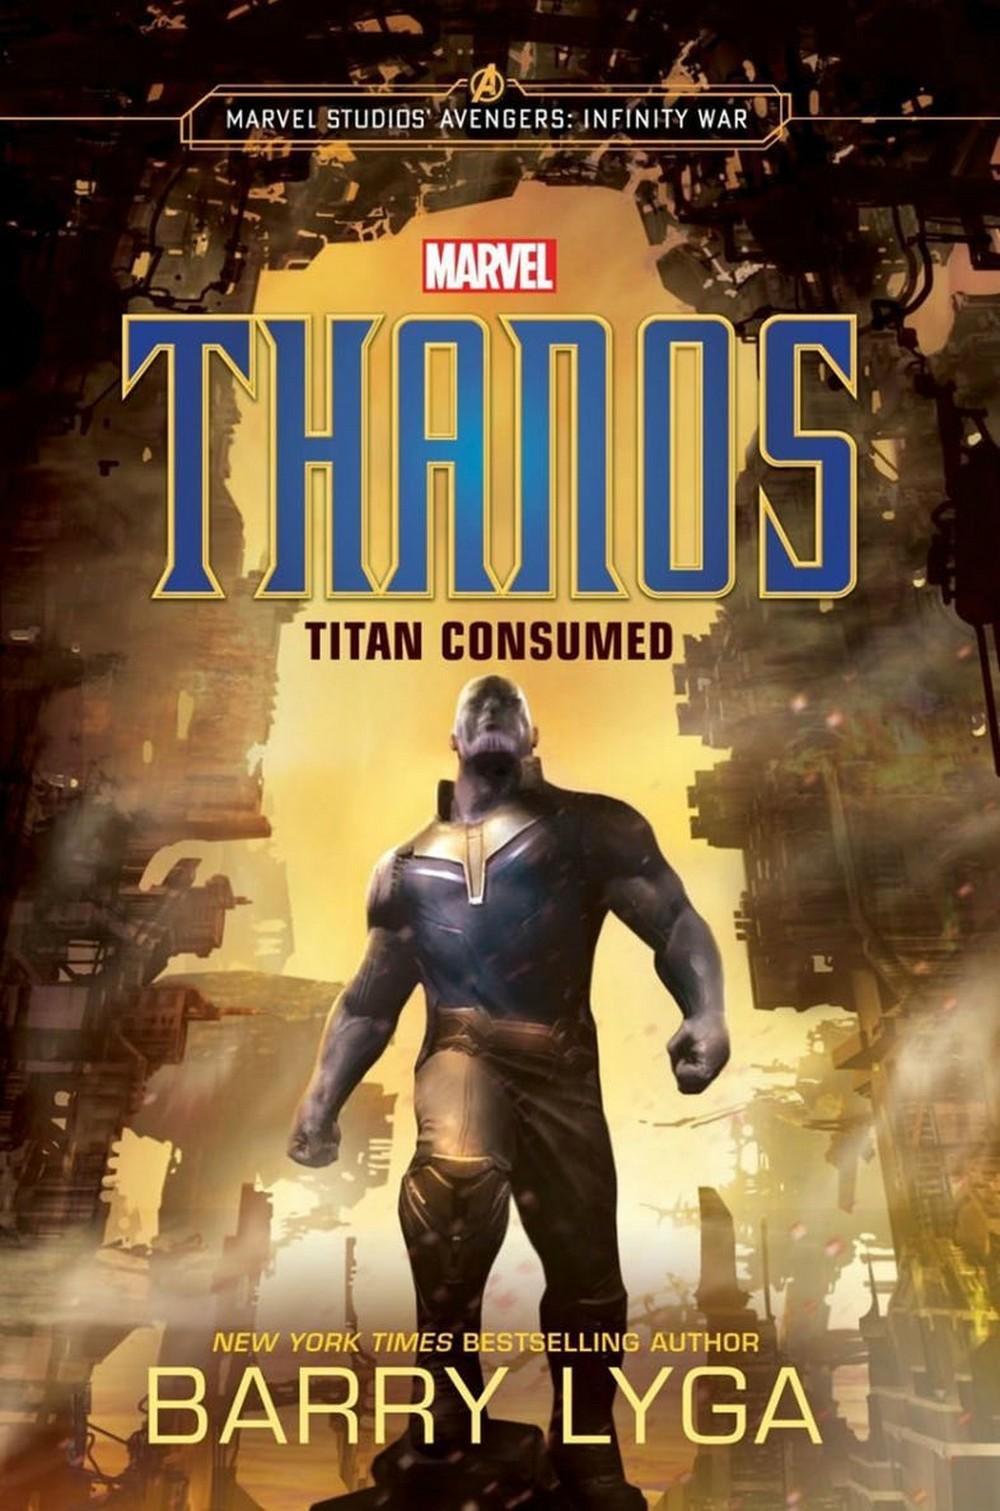 Marvel's Avengers: Infinity War: Thanos - Titan Consumed